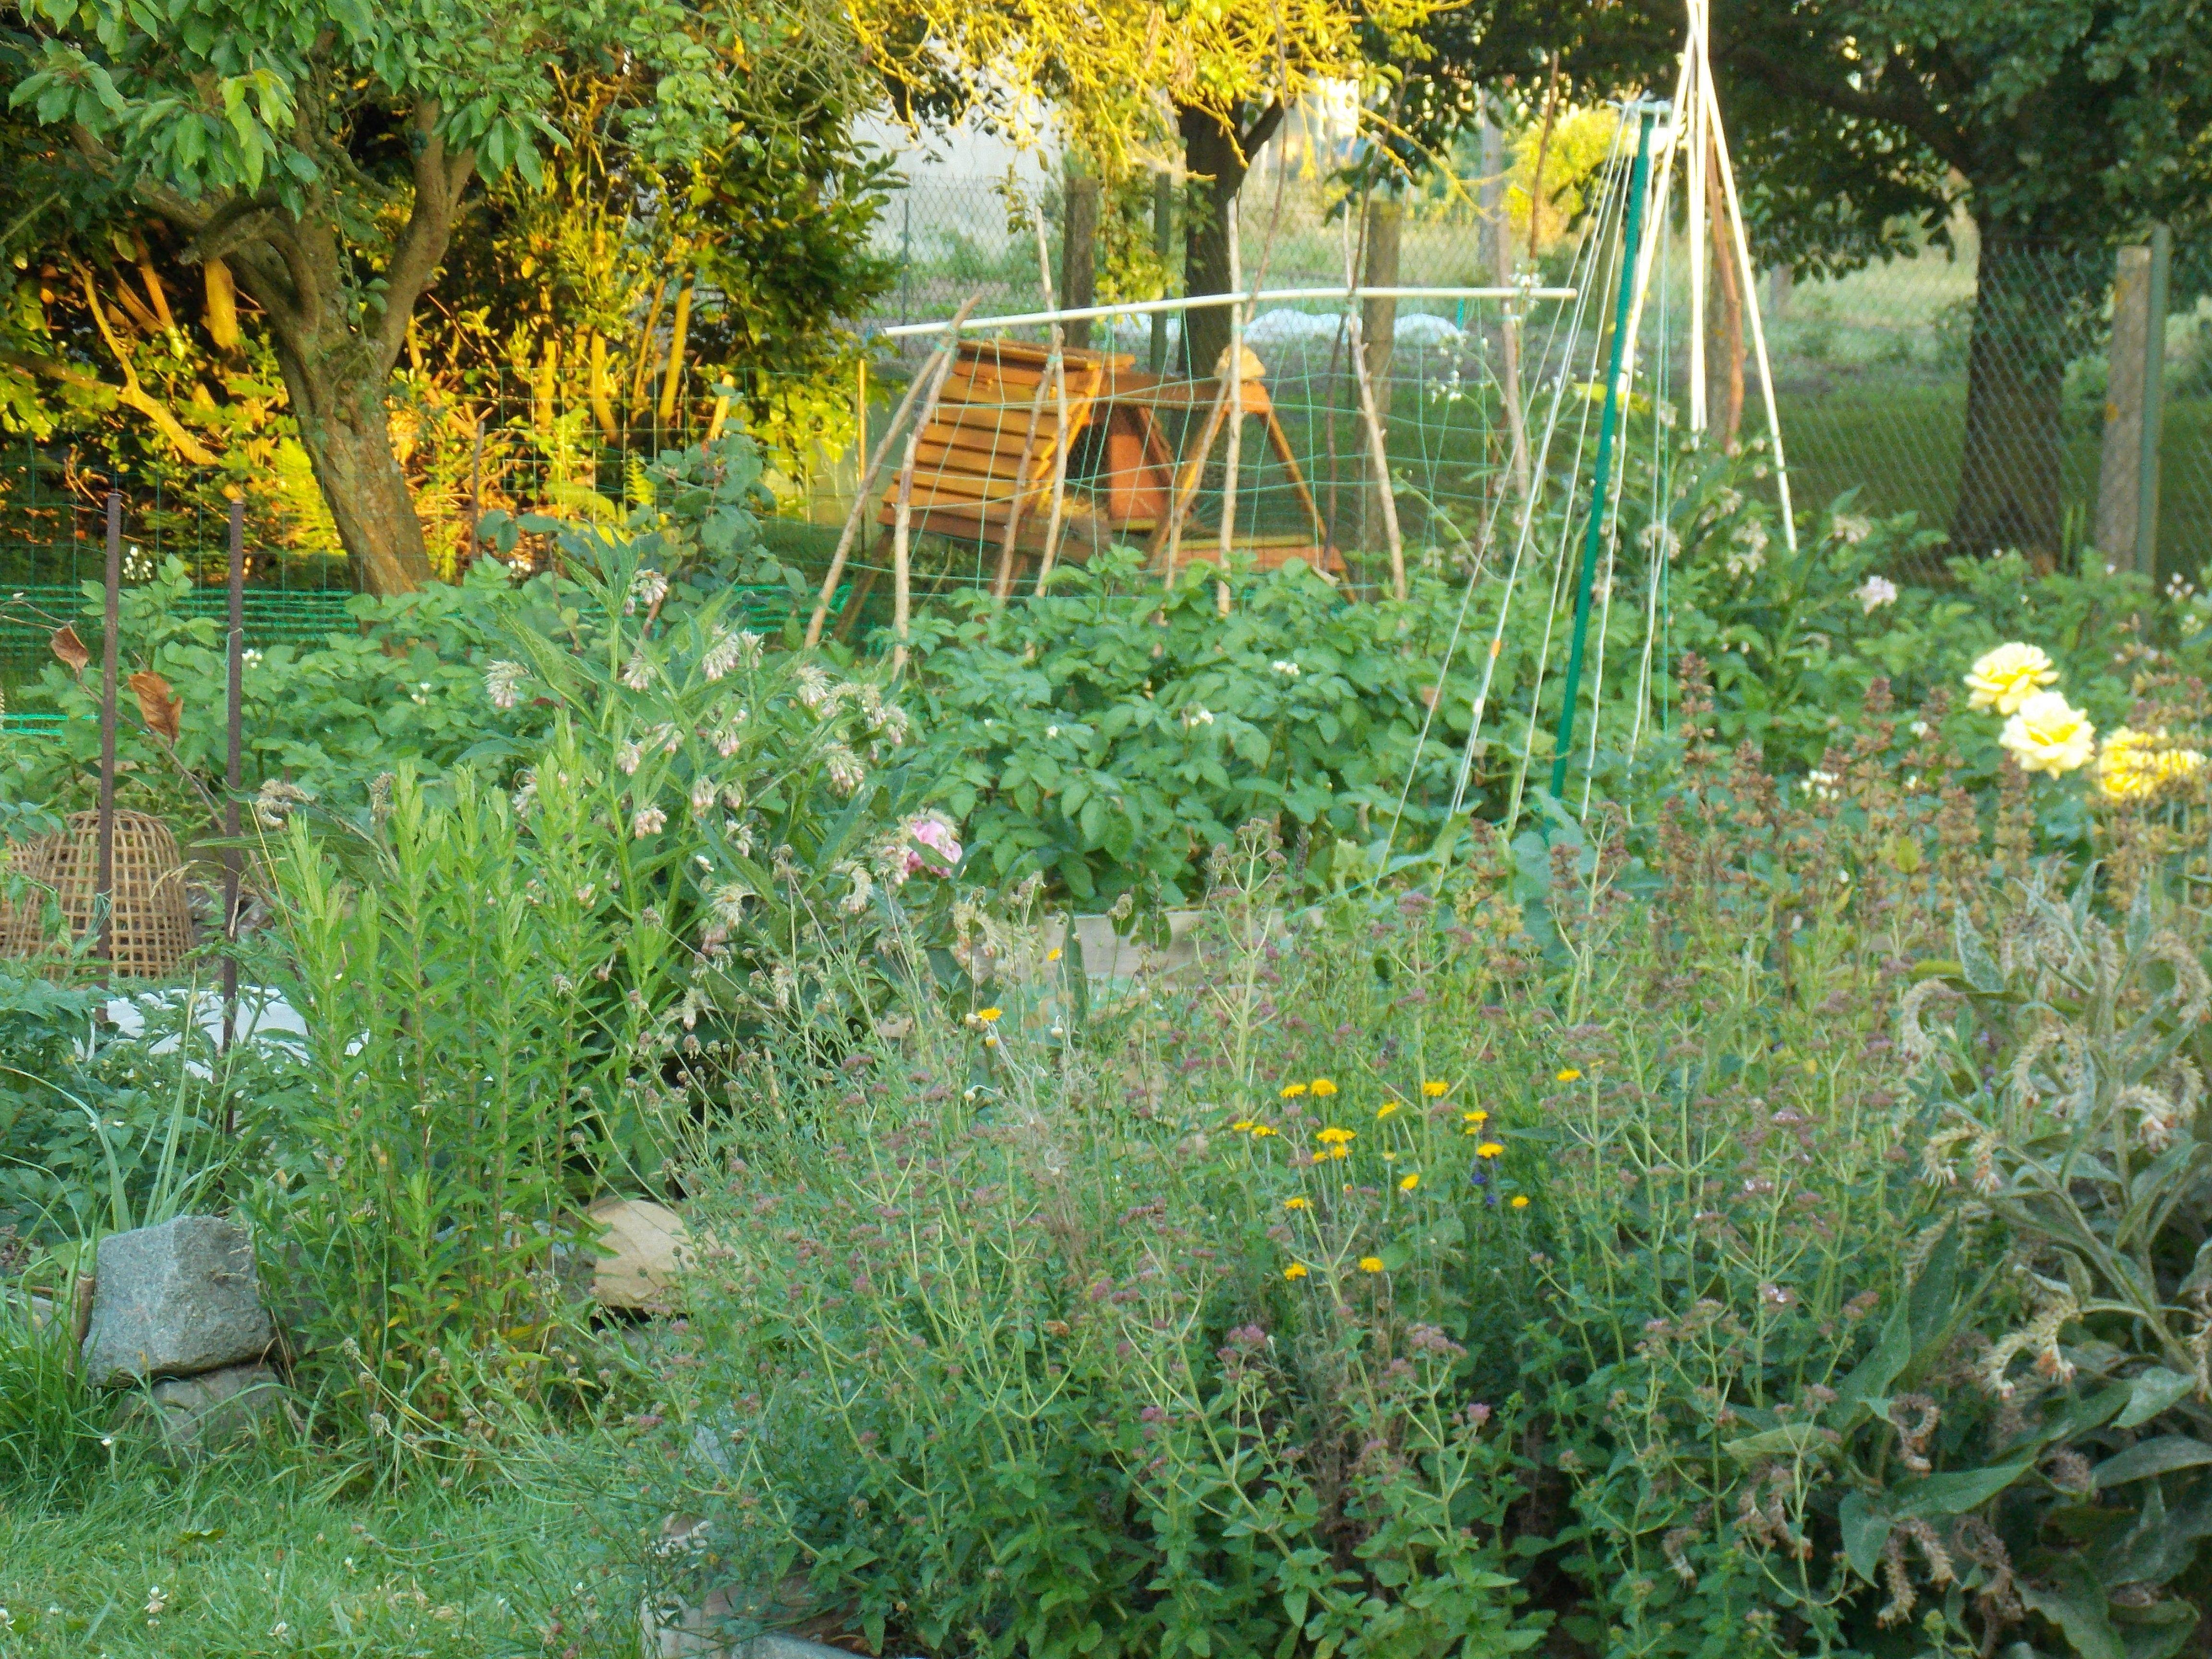 411752addbfbb444ac9e69d243924af4 Frais De Haie De Jardin Concept